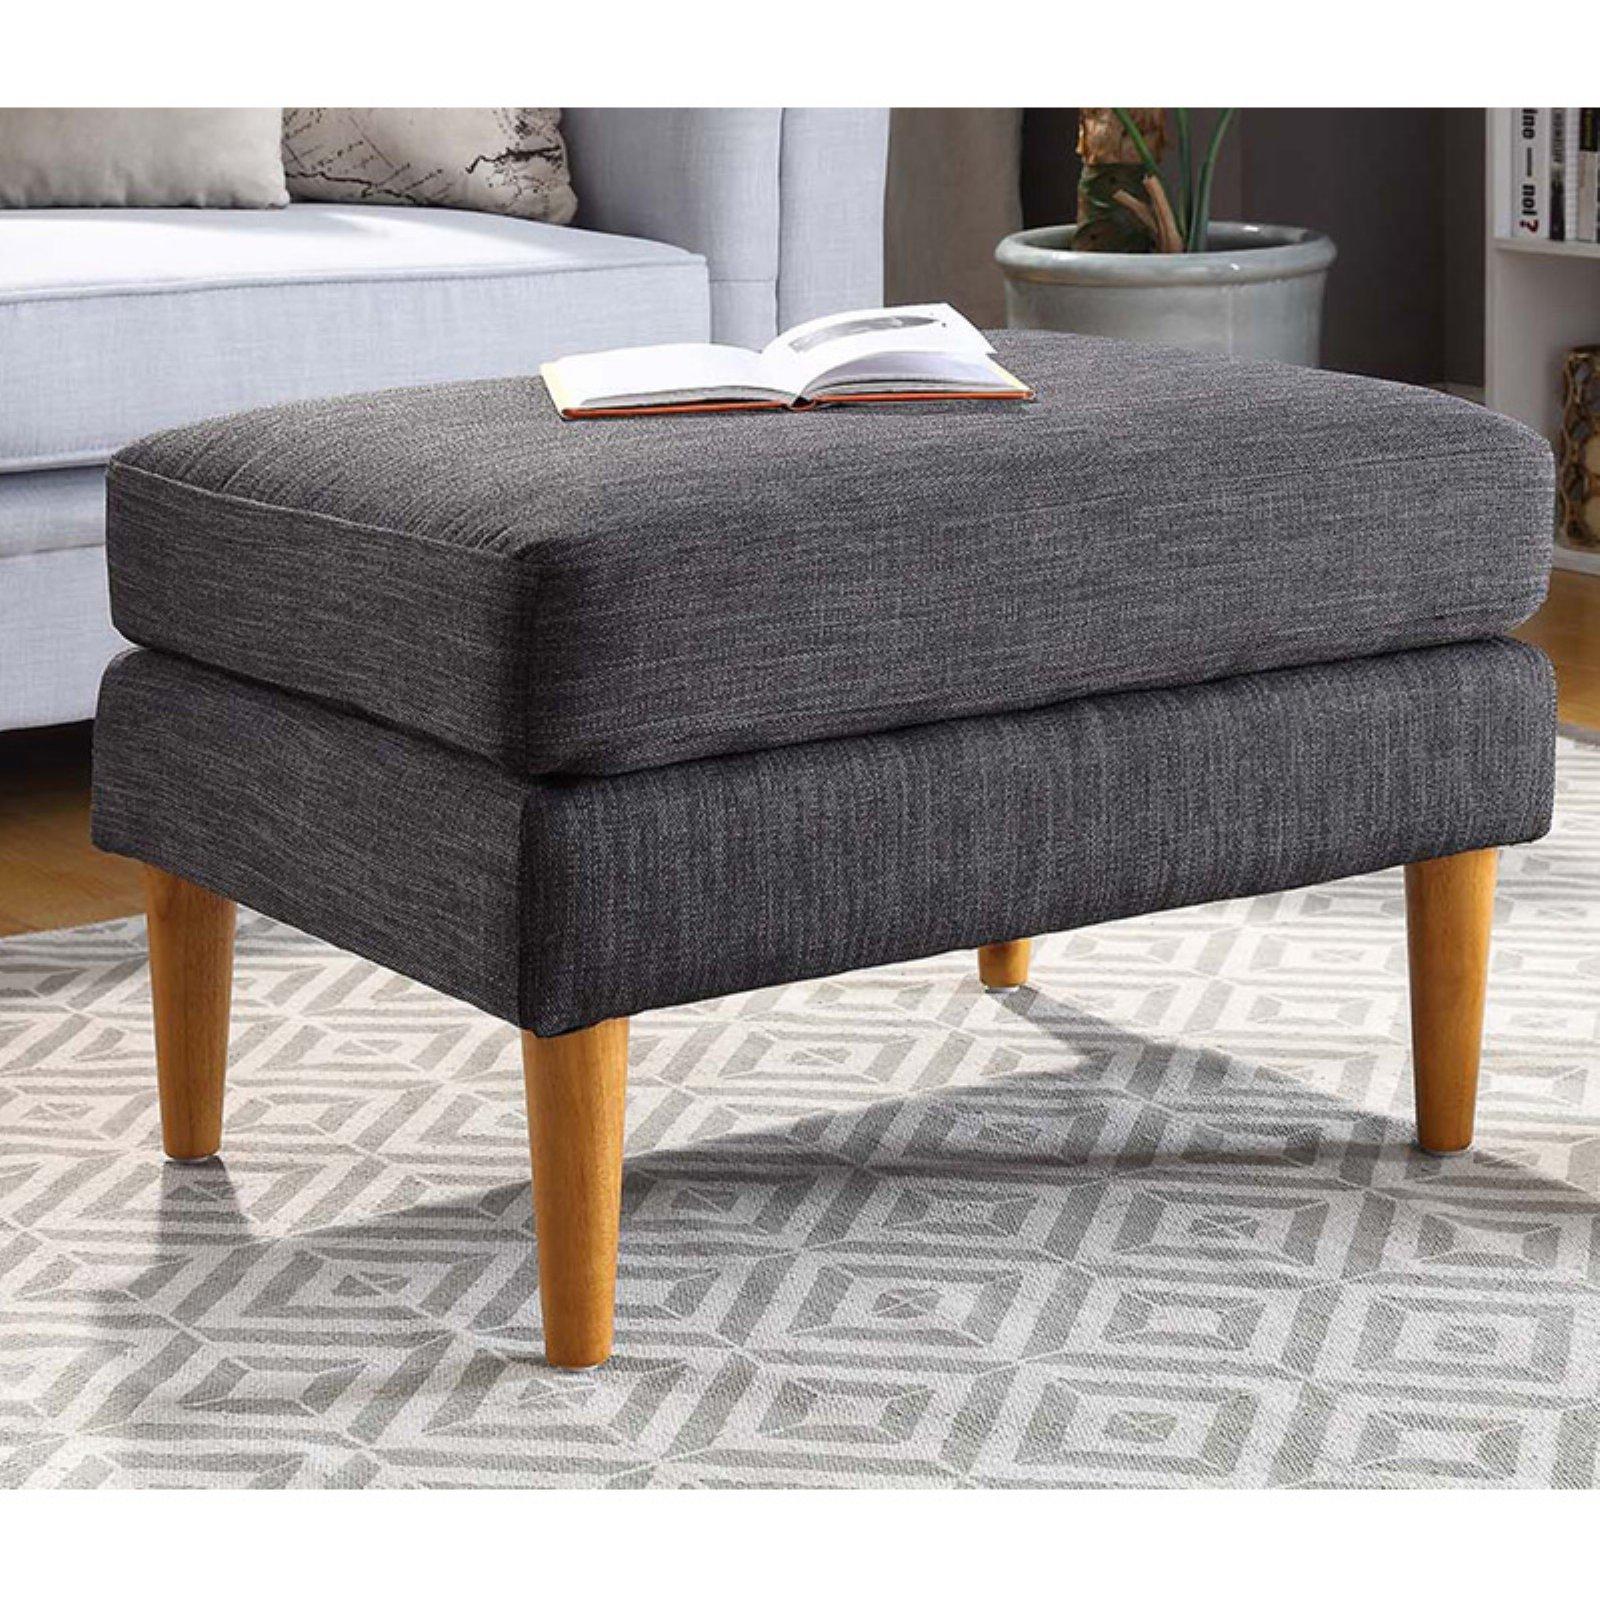 Convenience Concepts Designs4Comfort No Tools Marlow Mid Century Ottoman